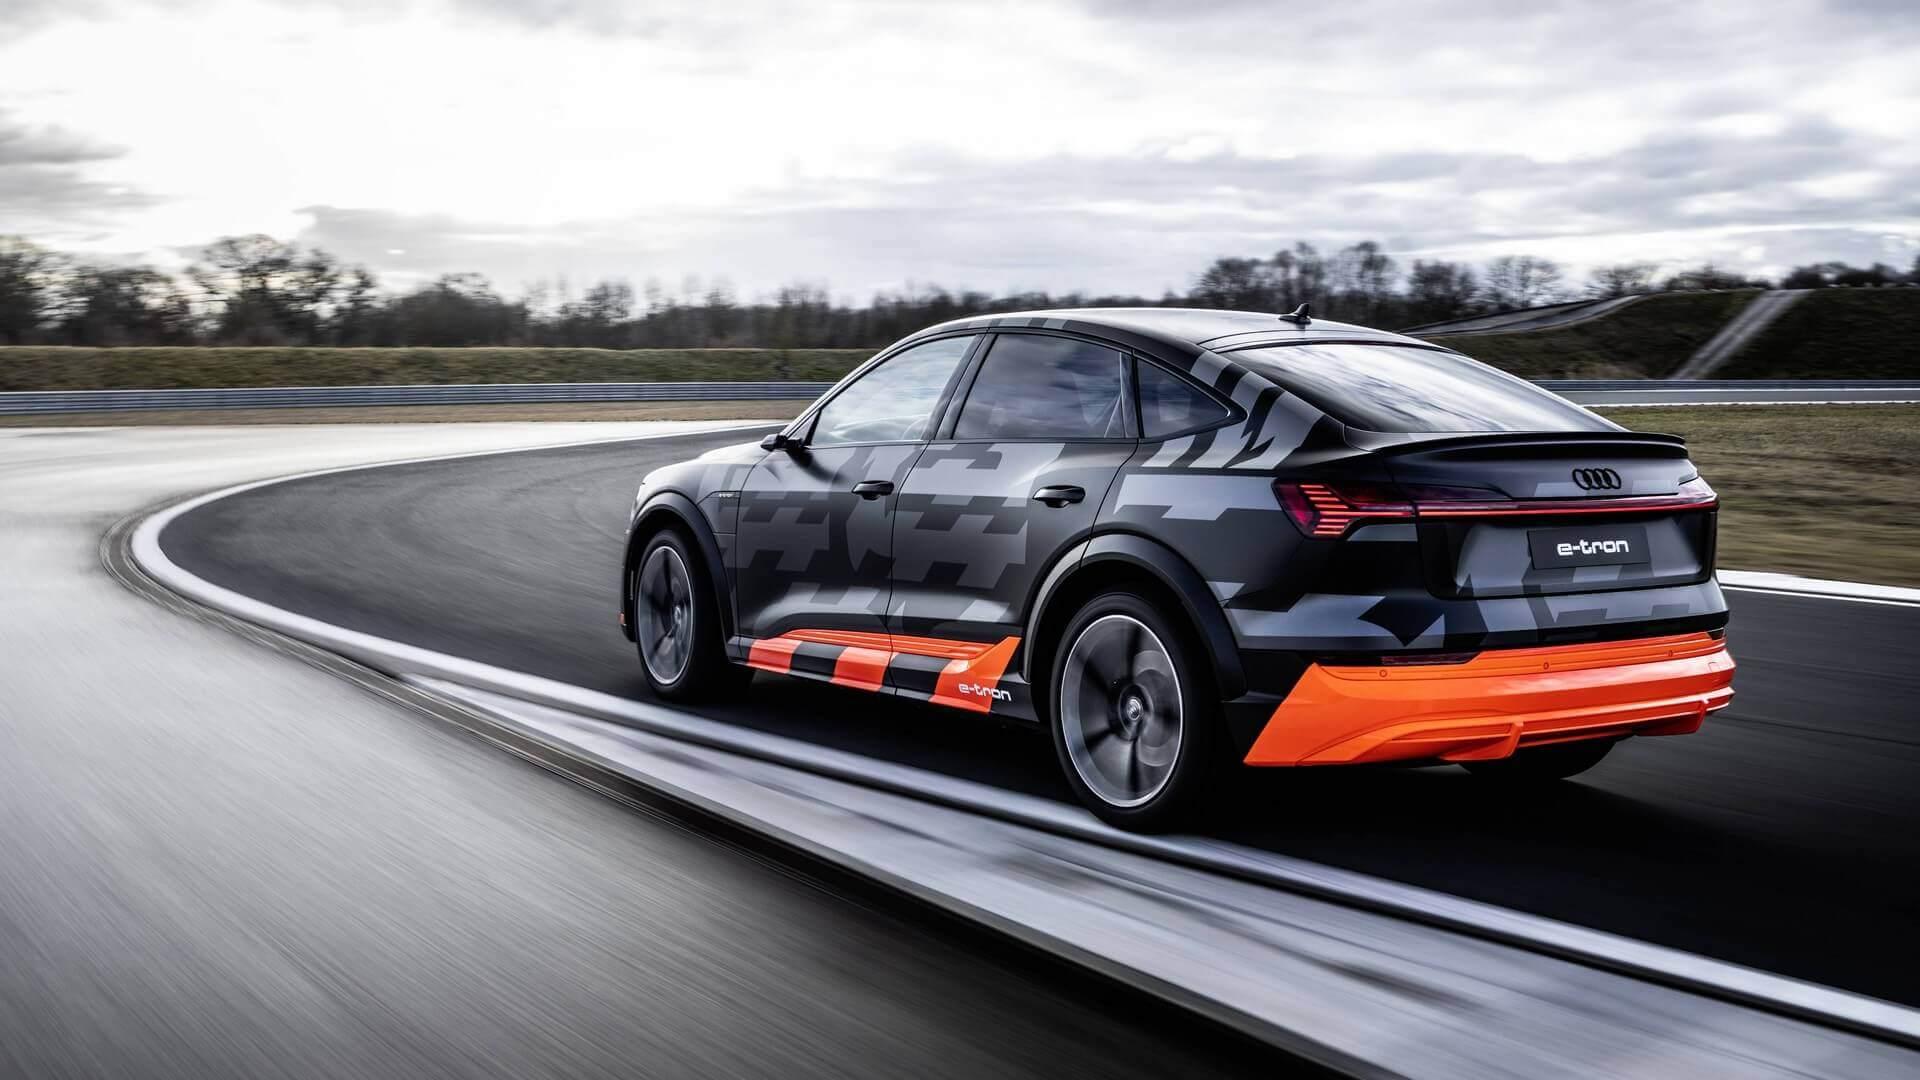 S-версия электрокроссовера Audi e-tron Sportback